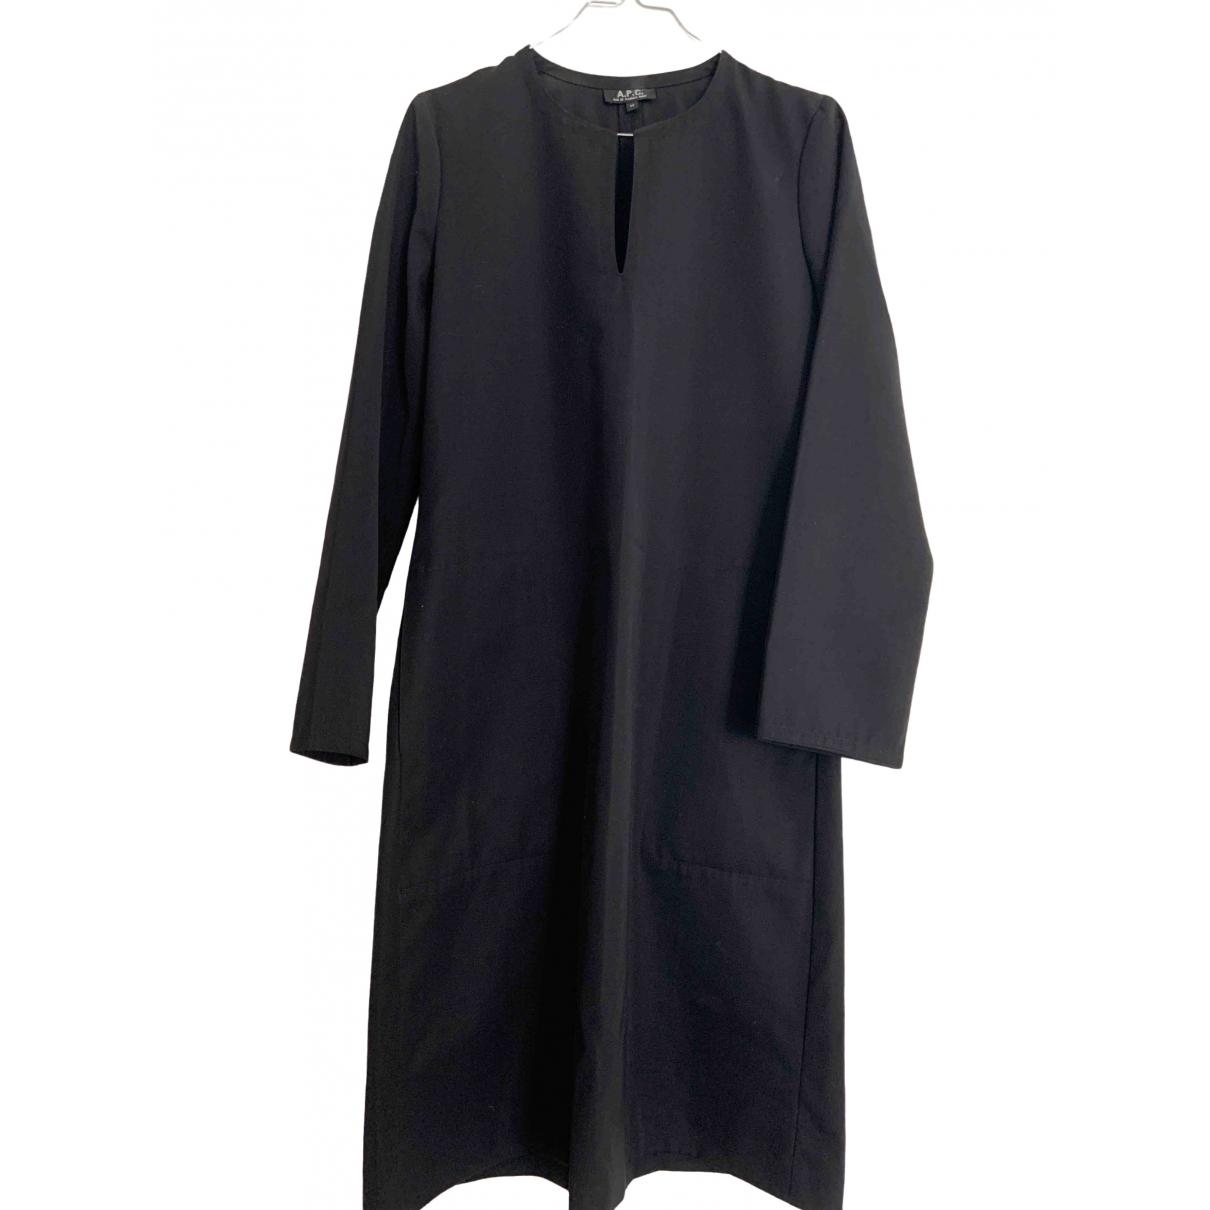 Apc \N Black Wool dress for Women M International